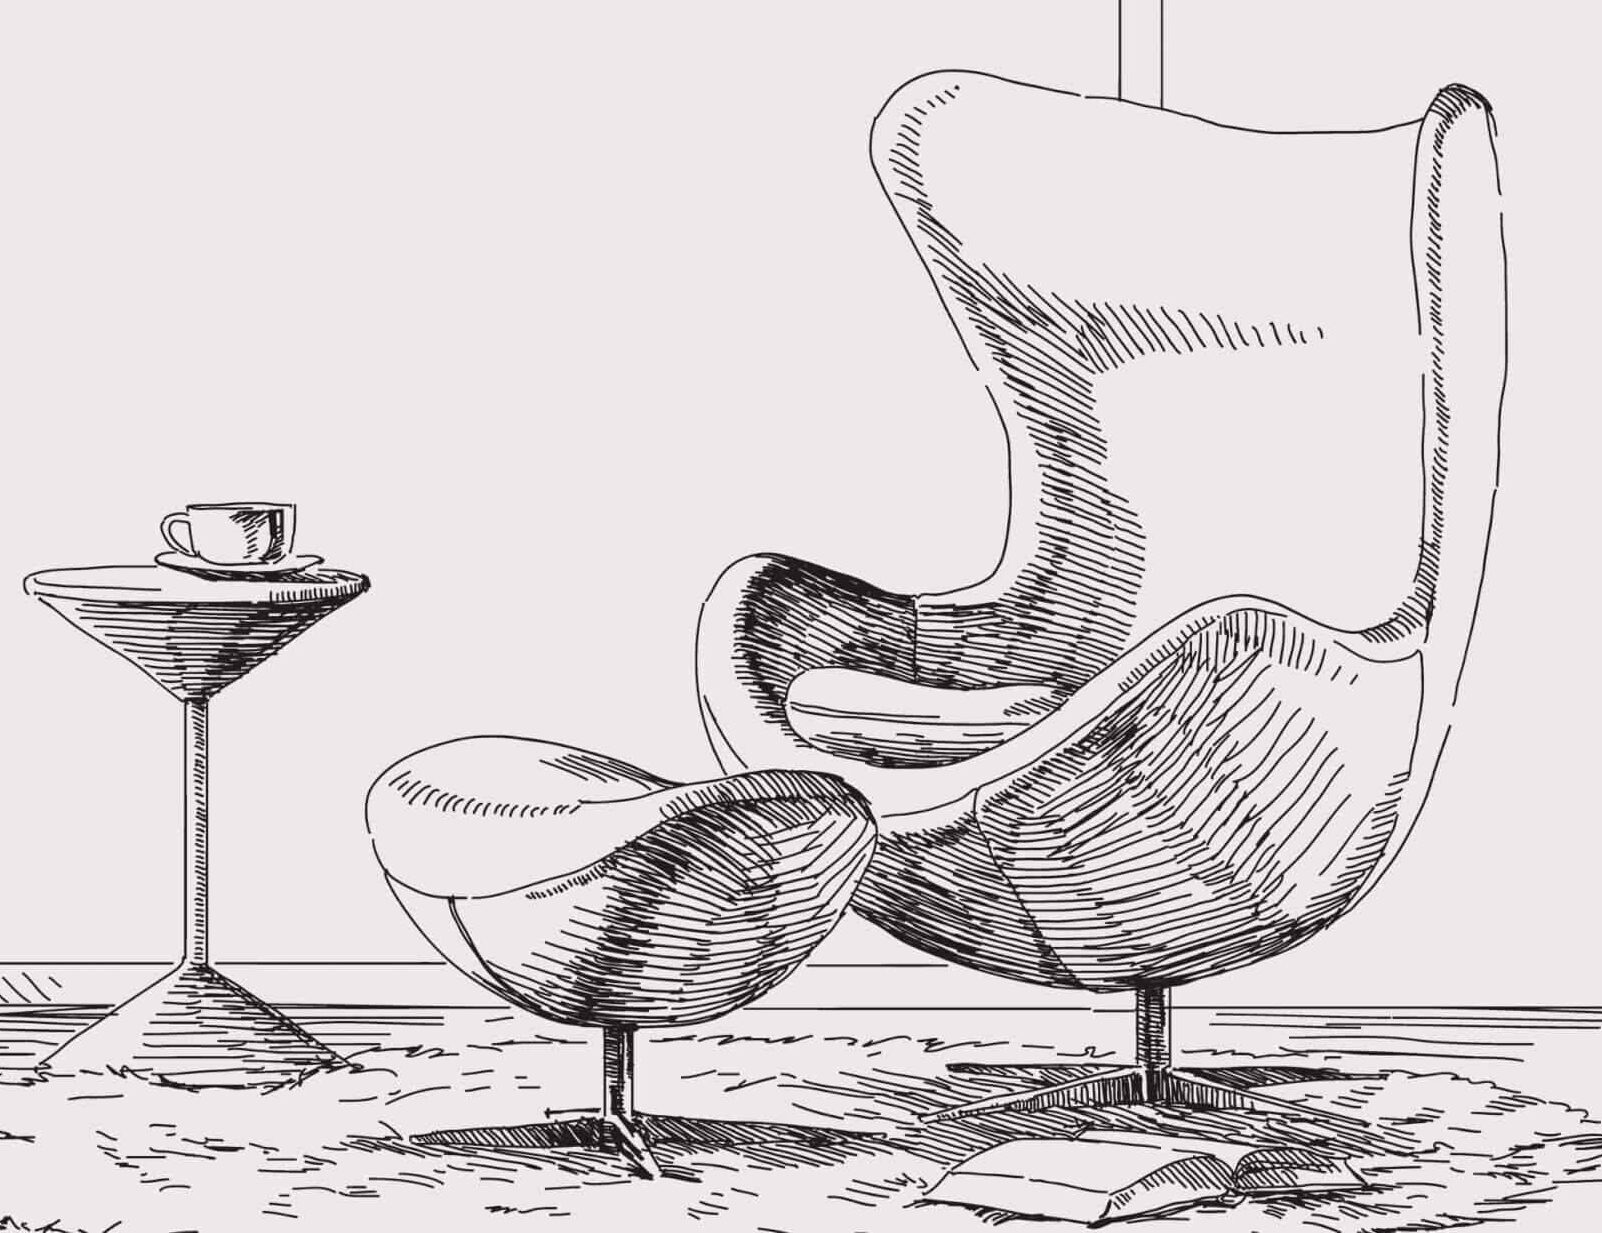 https://alayoubi.com/wp-content/uploads/2017/05/image-lined-chair-2-e1618996742841.jpg